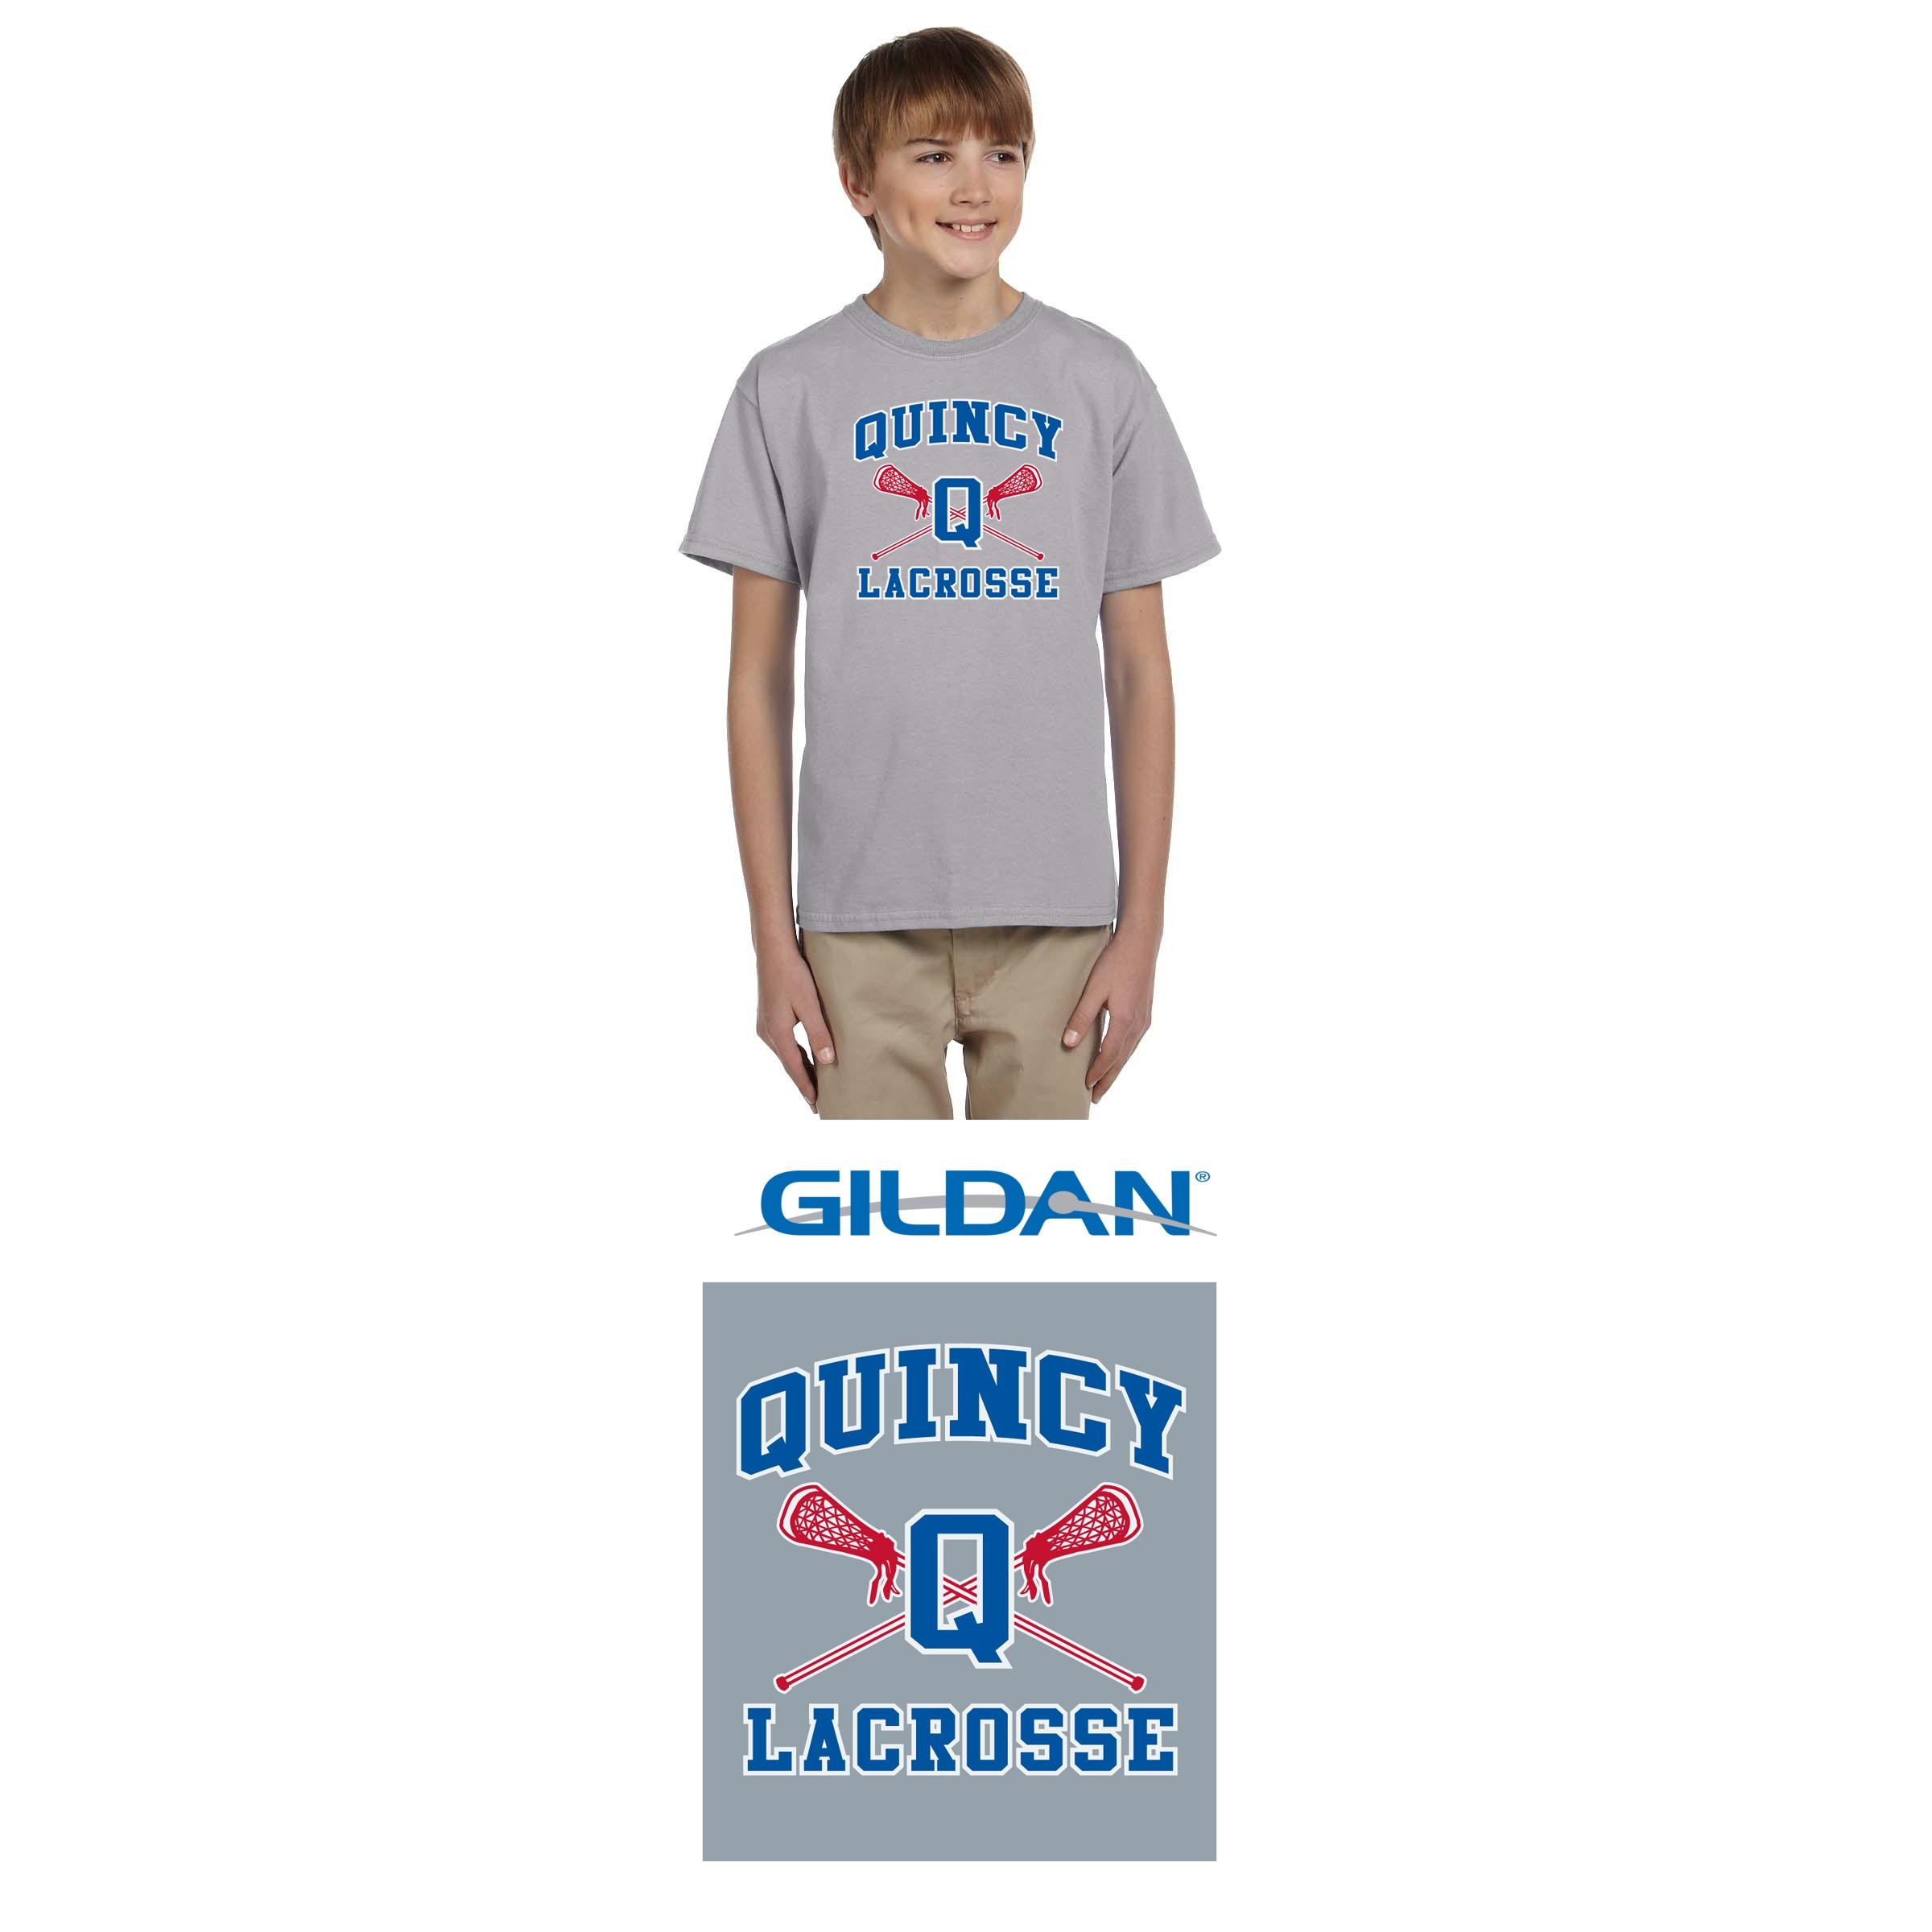 Quincy Lacrosse Gildan Ultra Cotton® 6 oz. T-Shirt, Youth Fit